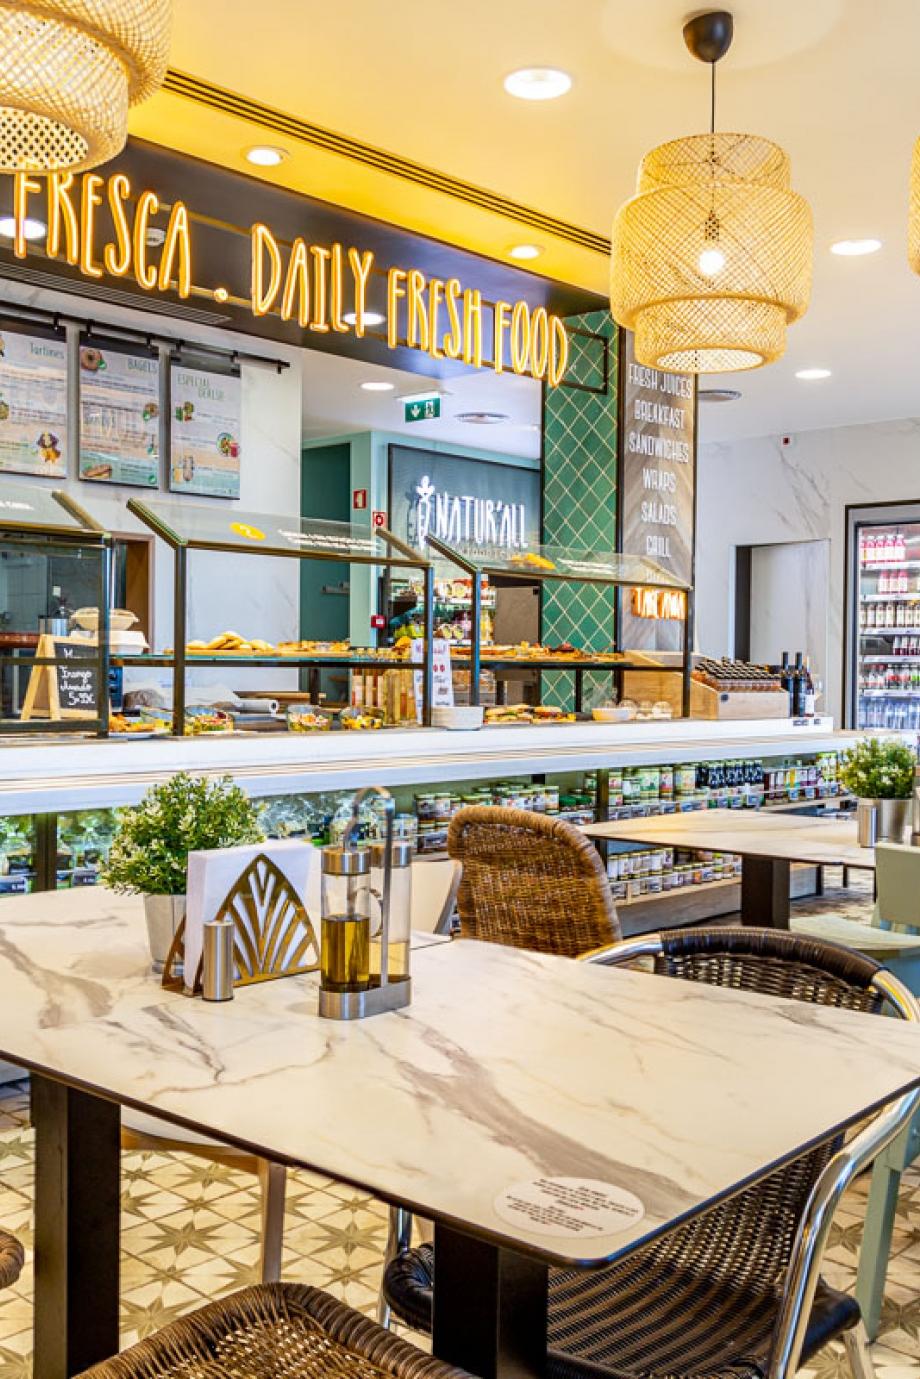 AlgarveCool_Comer_Natur'all_–_Fresh_Food_Lovers